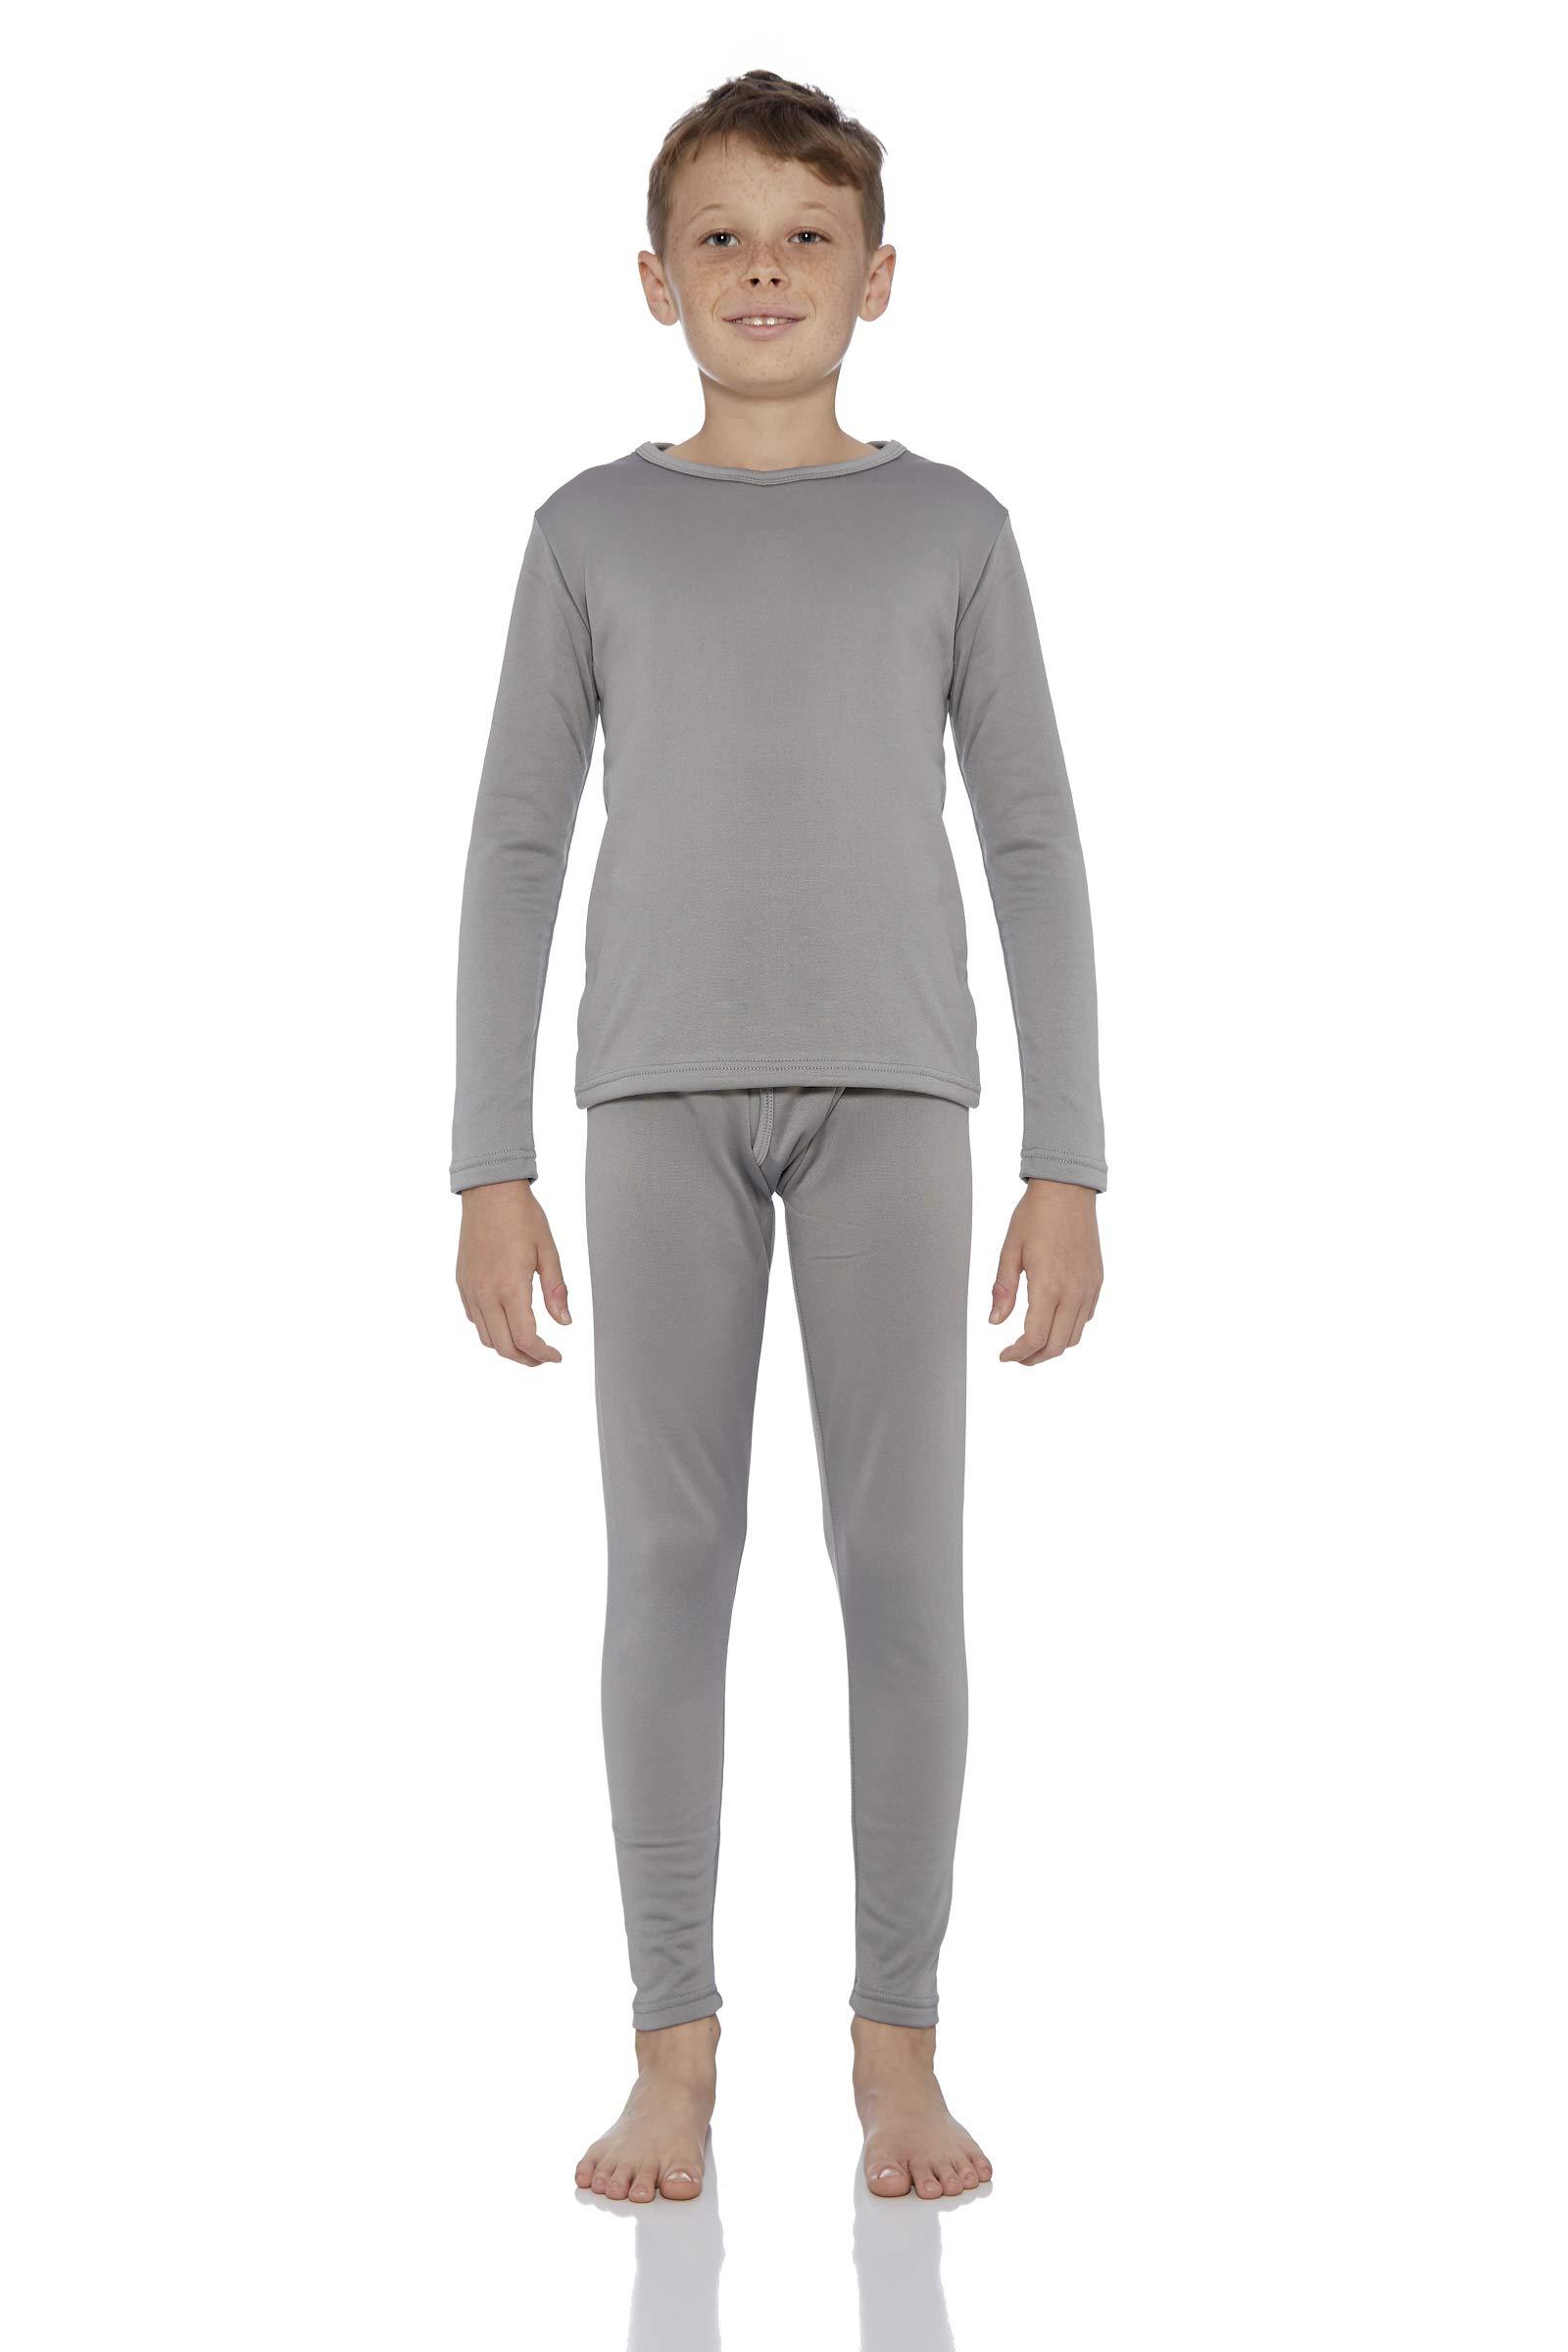 Rocky Boy's Fleece Lined Thermal Underwear 2PC Set Long John Top and Bottom (XS, Grey)